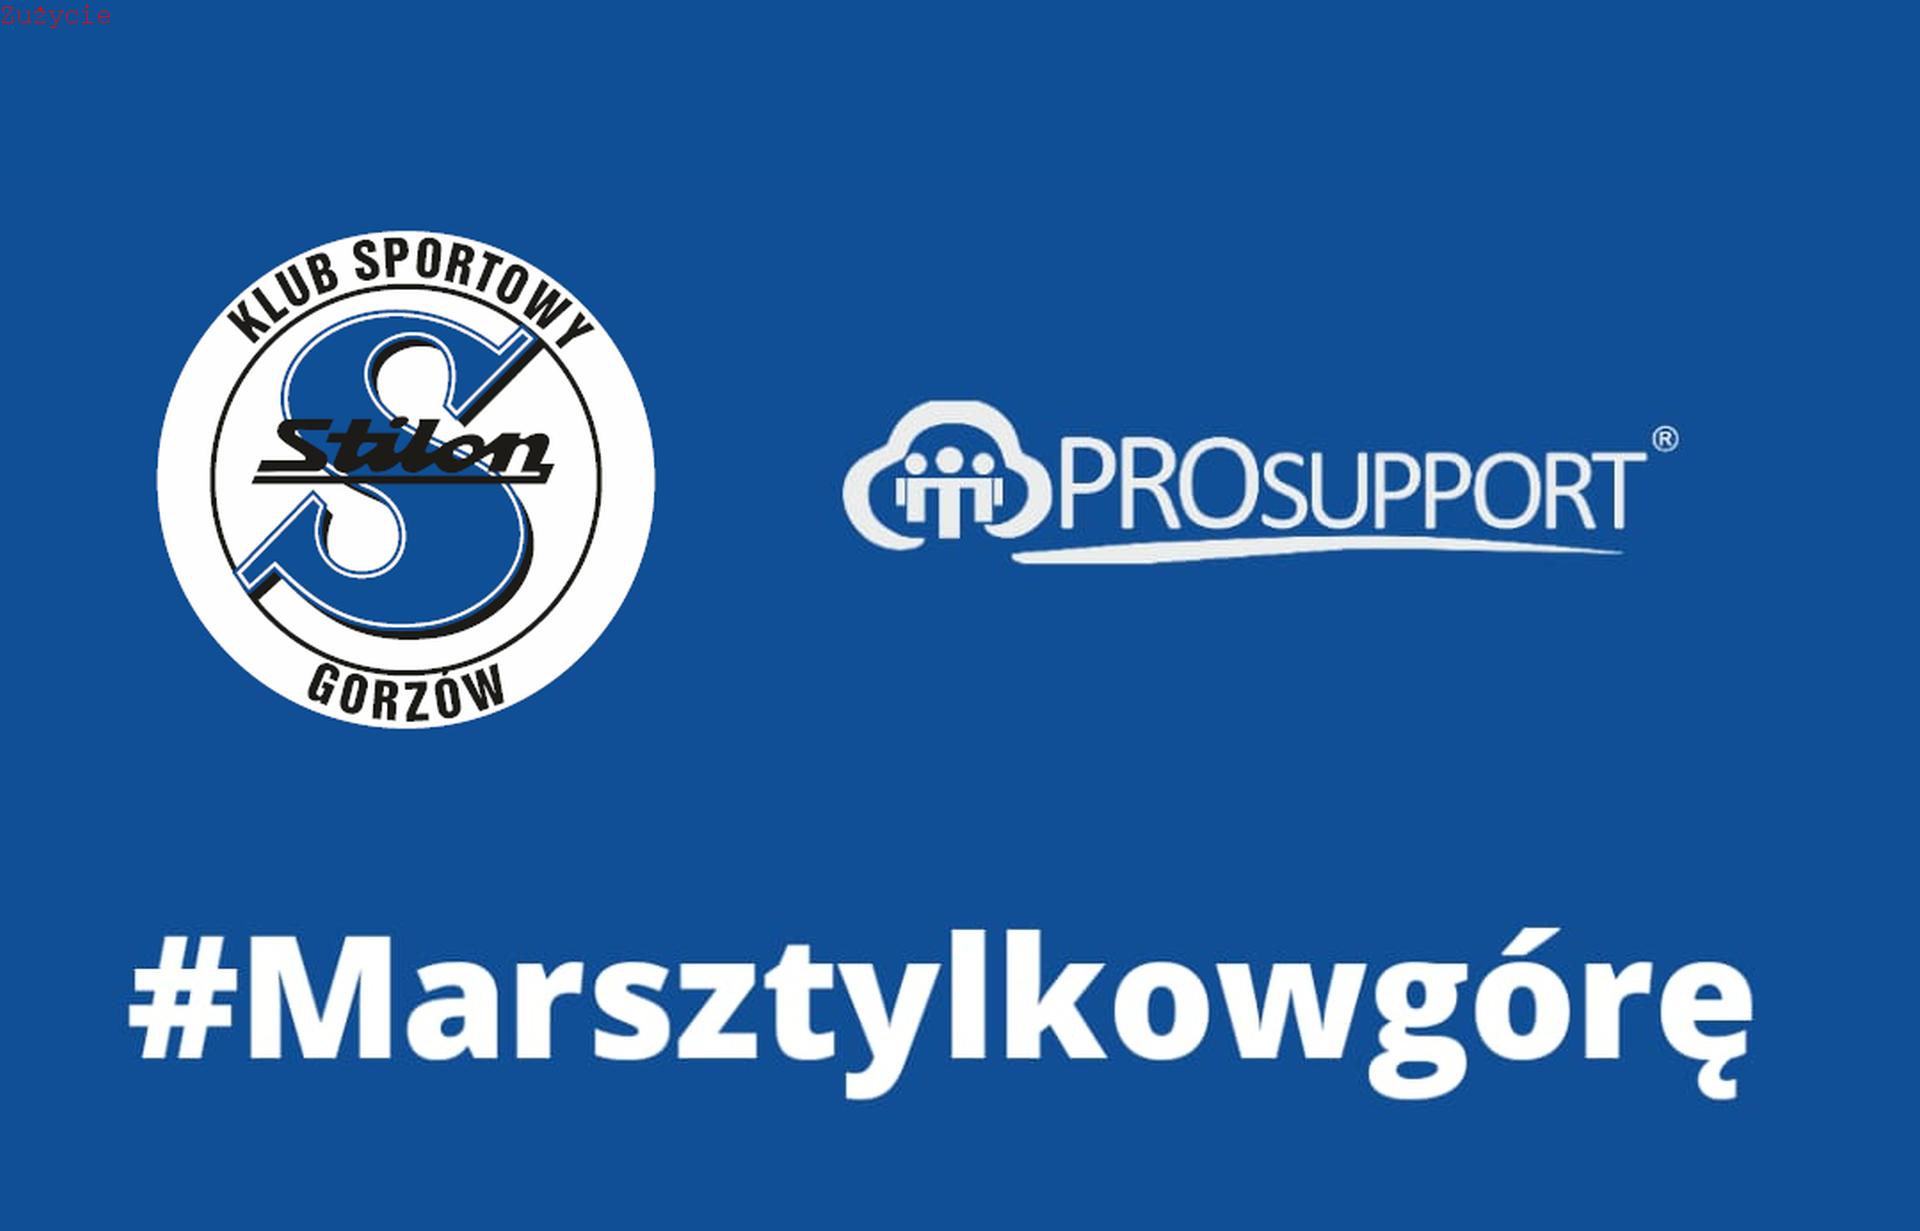 http://akademia.stilon.gorzow.pl/wp-content/uploads/2020/07/marsz1920x1230.png